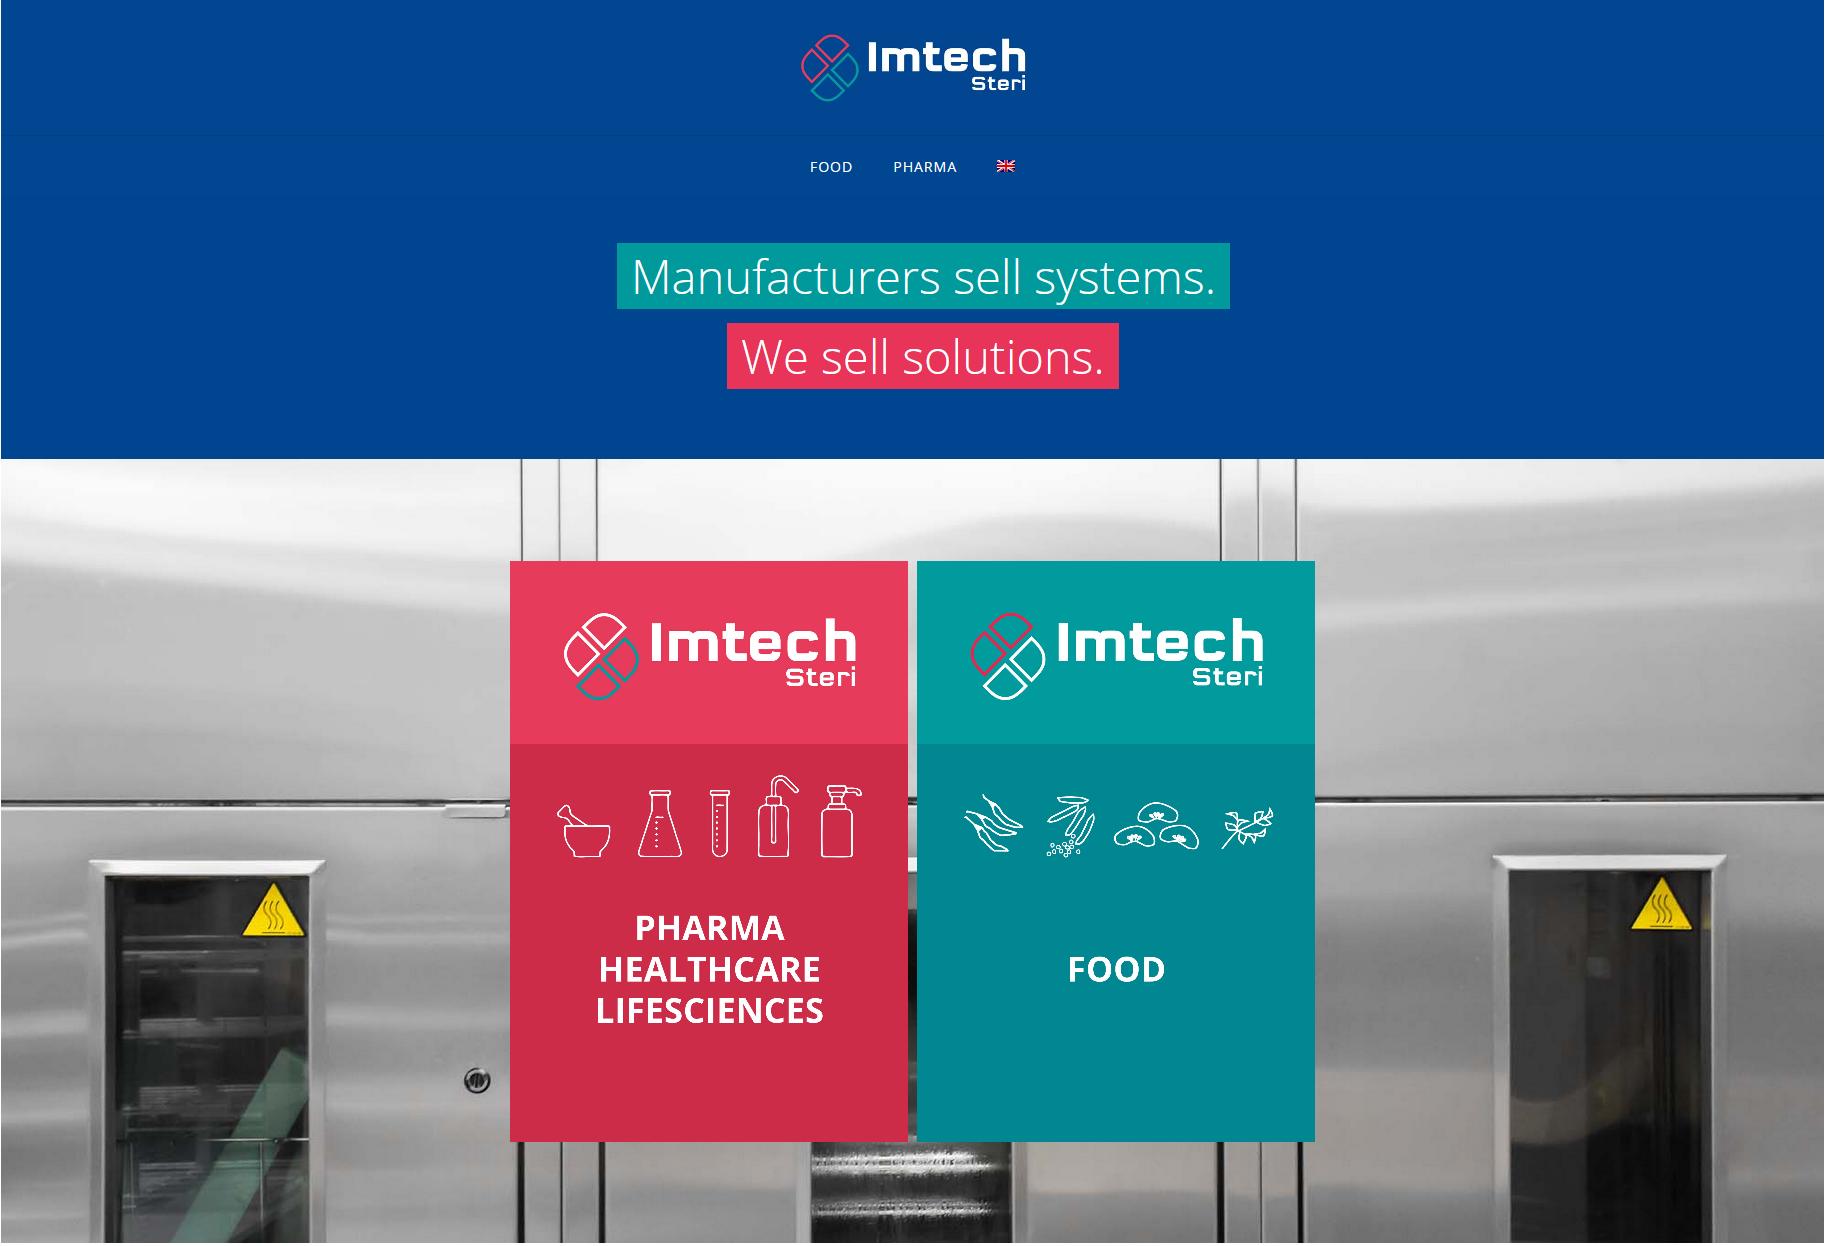 imtech steri Homepage